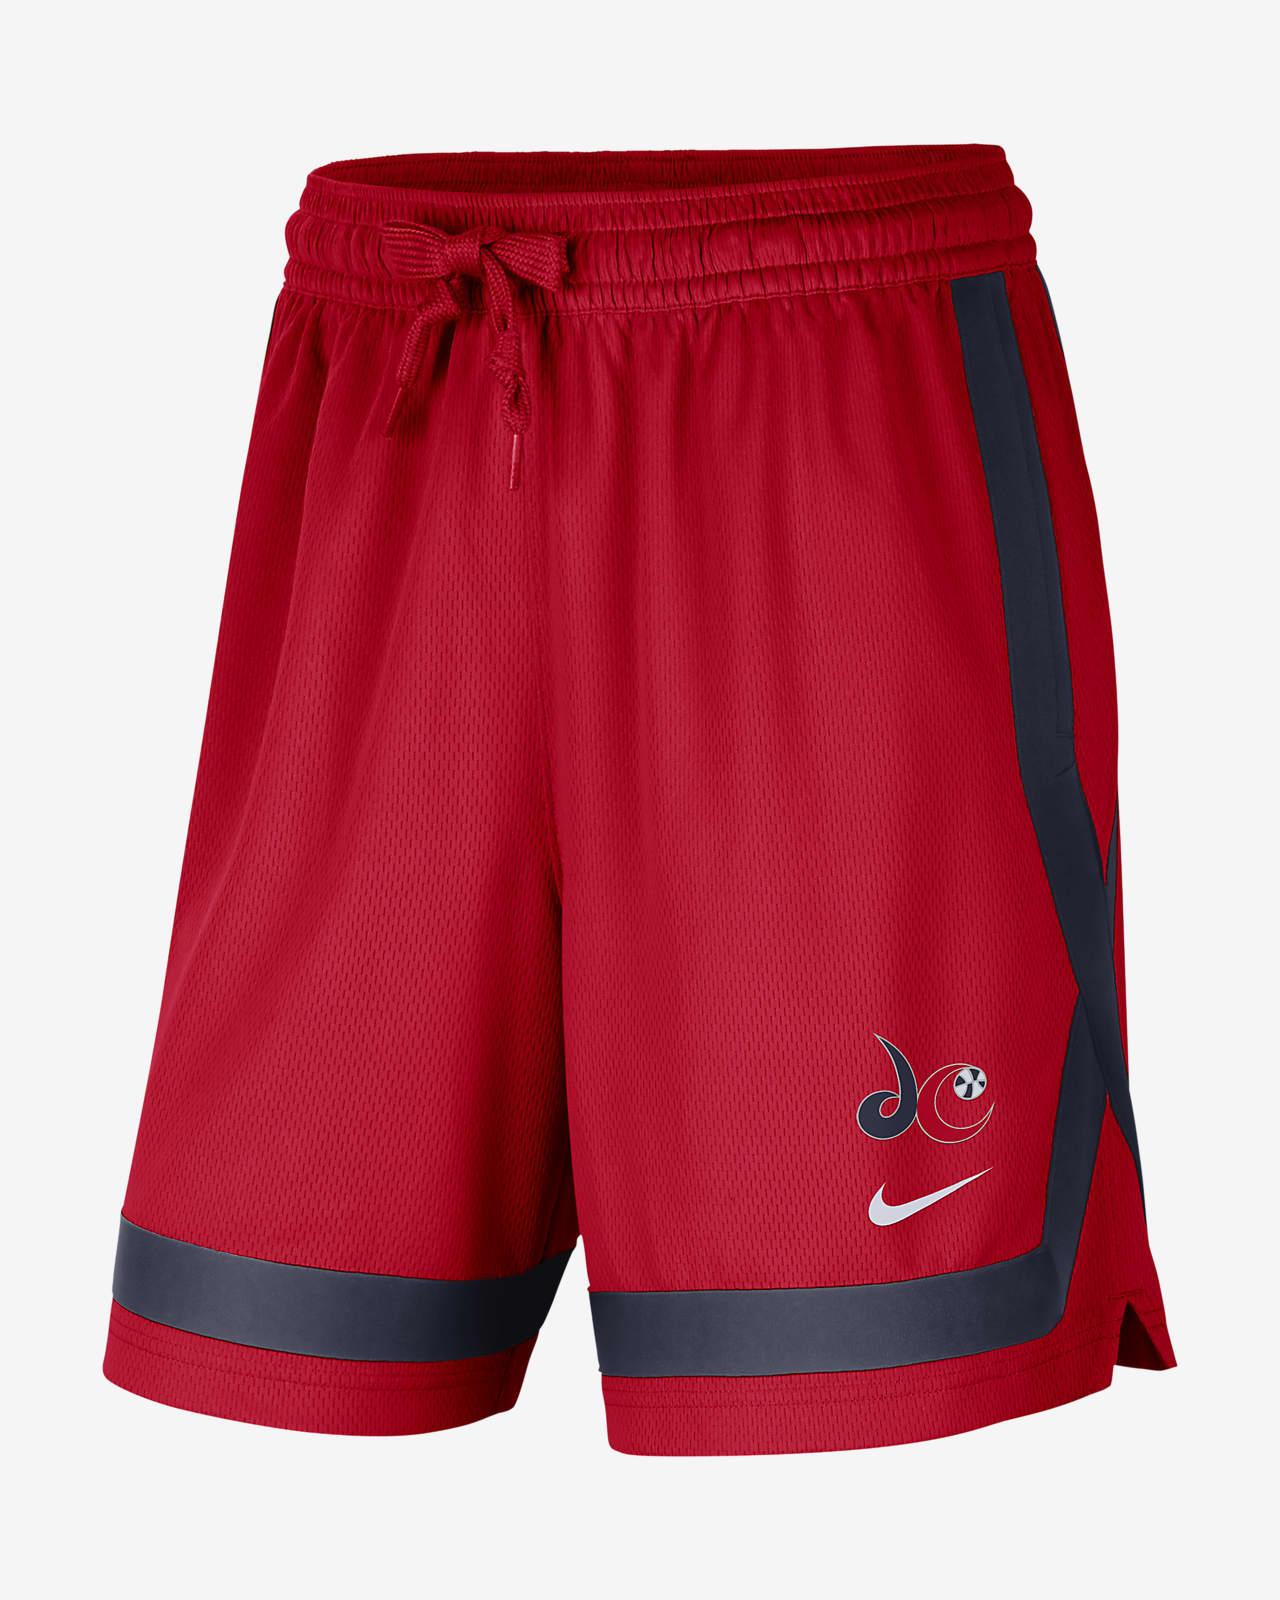 Washington Mystics Women's Nike WNBA Practice Shorts